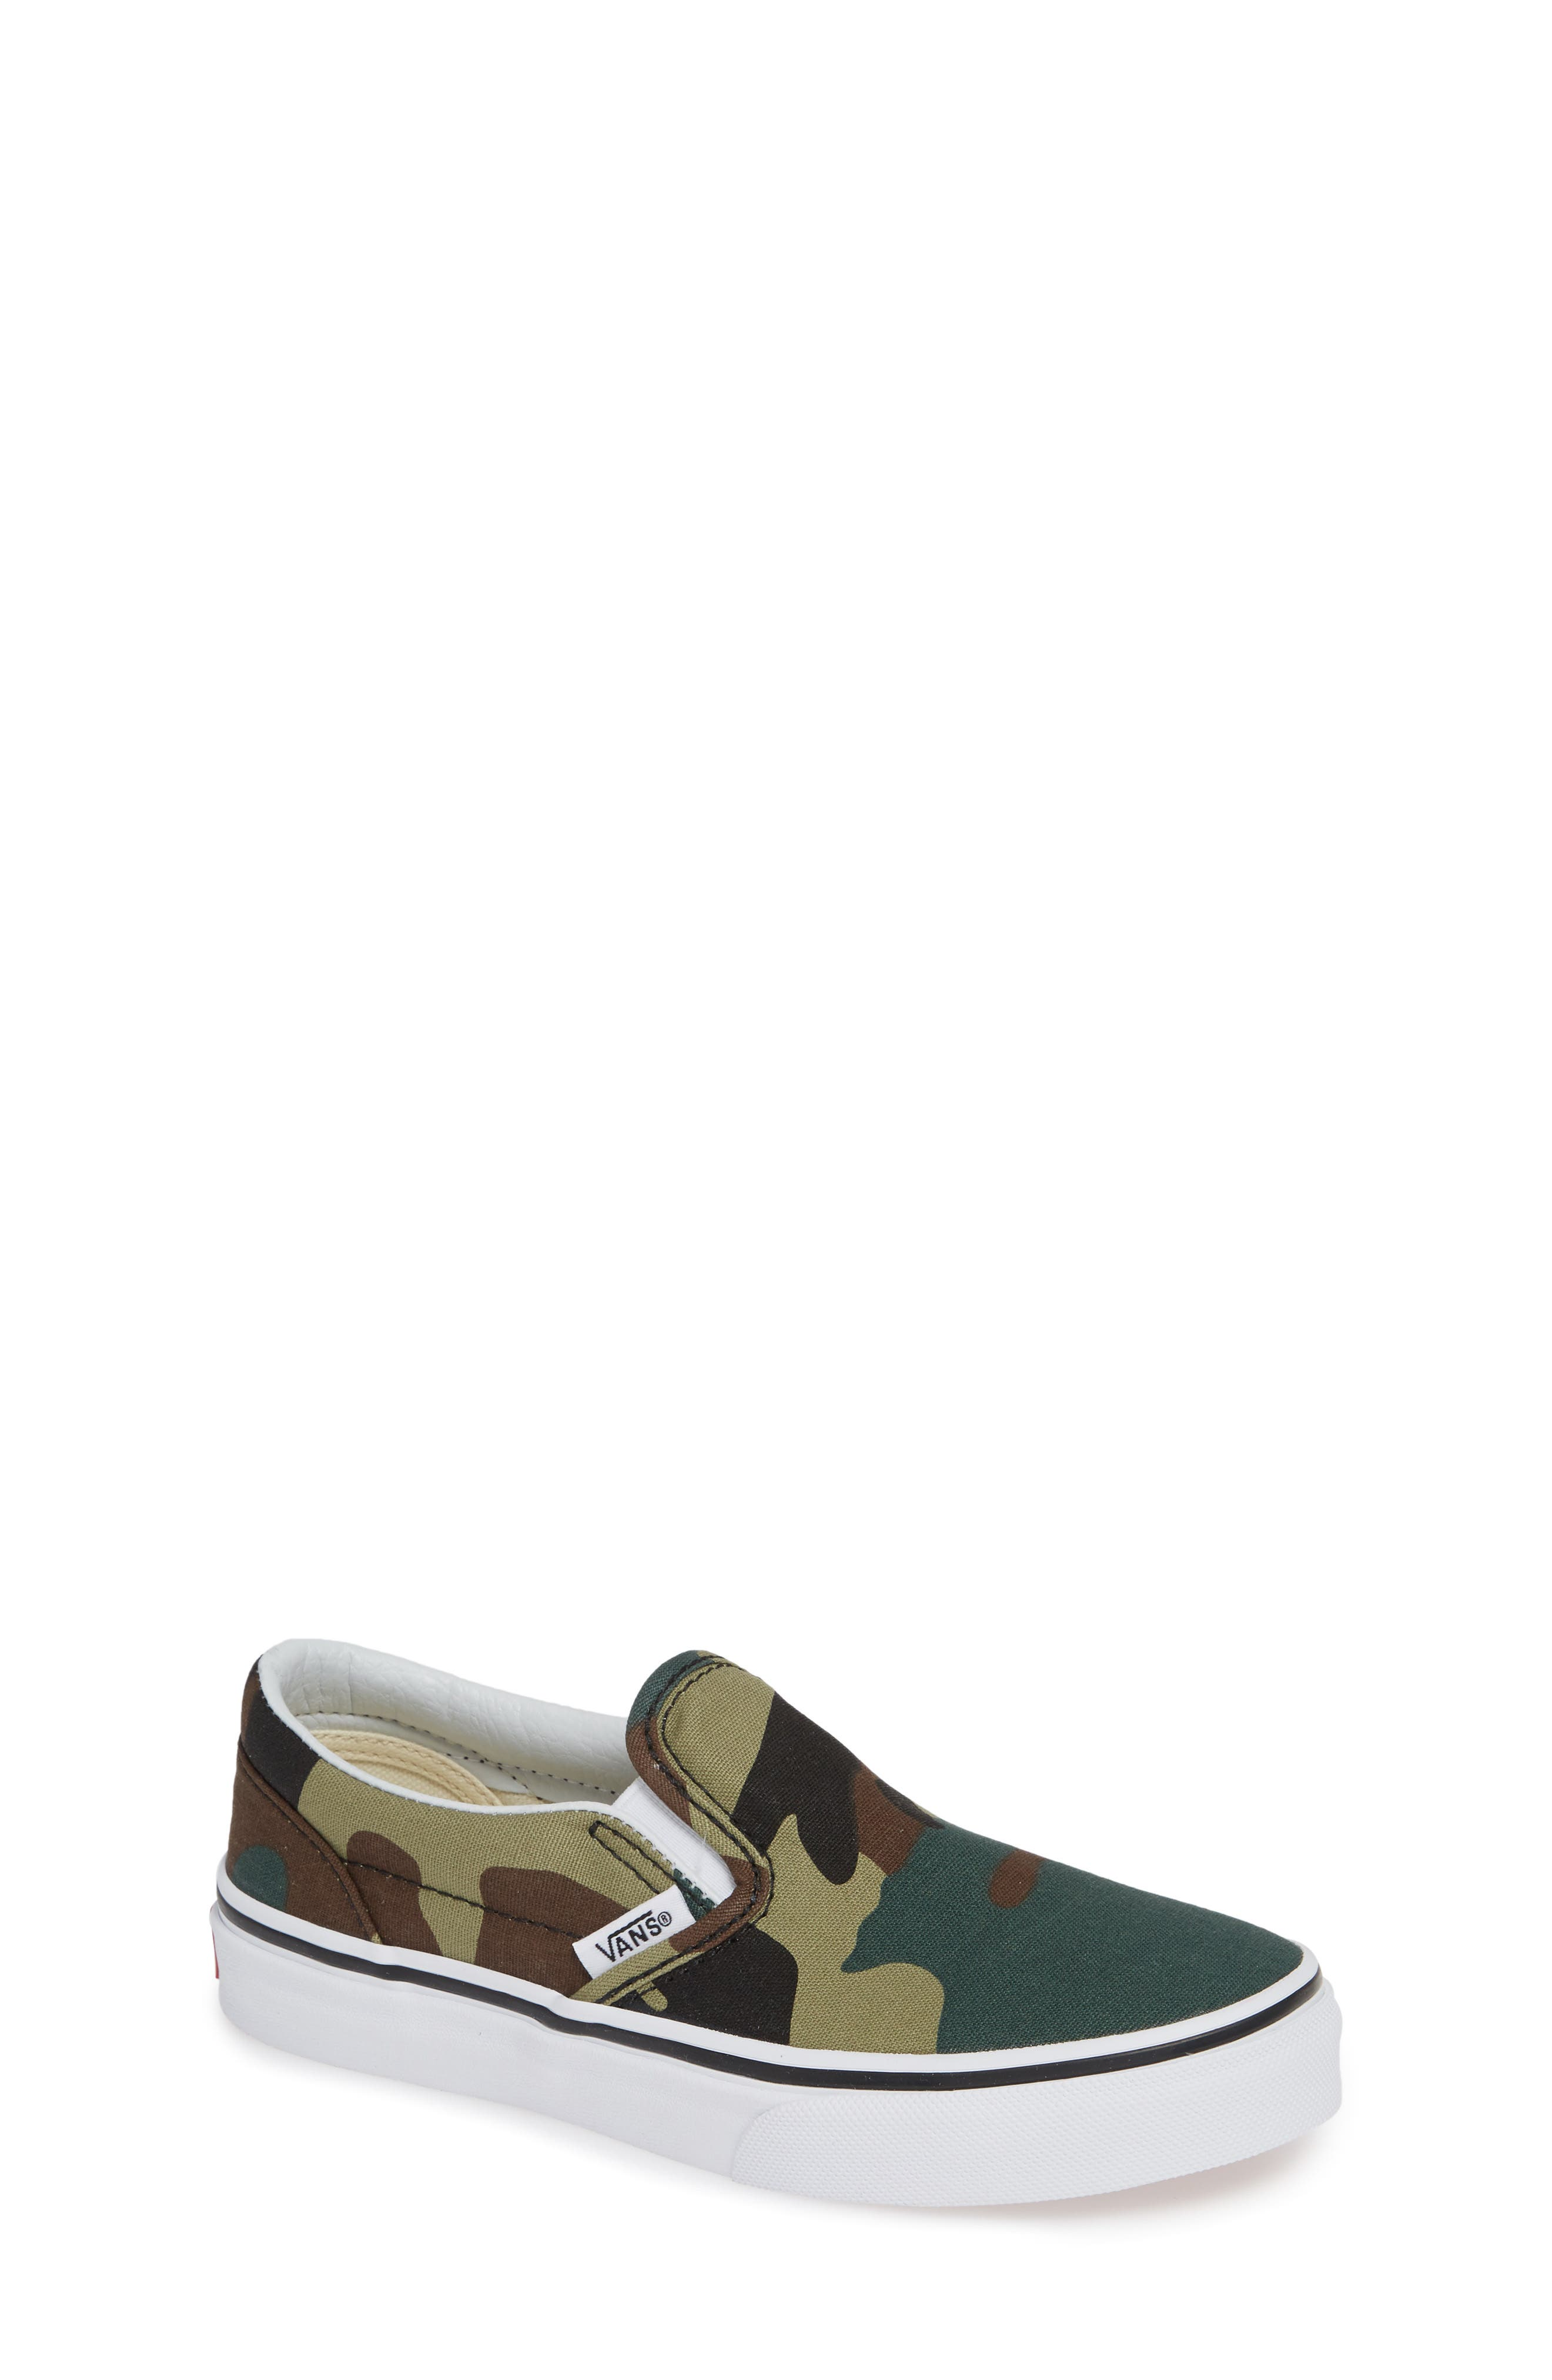 Classic Slip-On Sneaker,                             Main thumbnail 1, color,                             WOODLAND CAMO BLACK/ WOODLAND